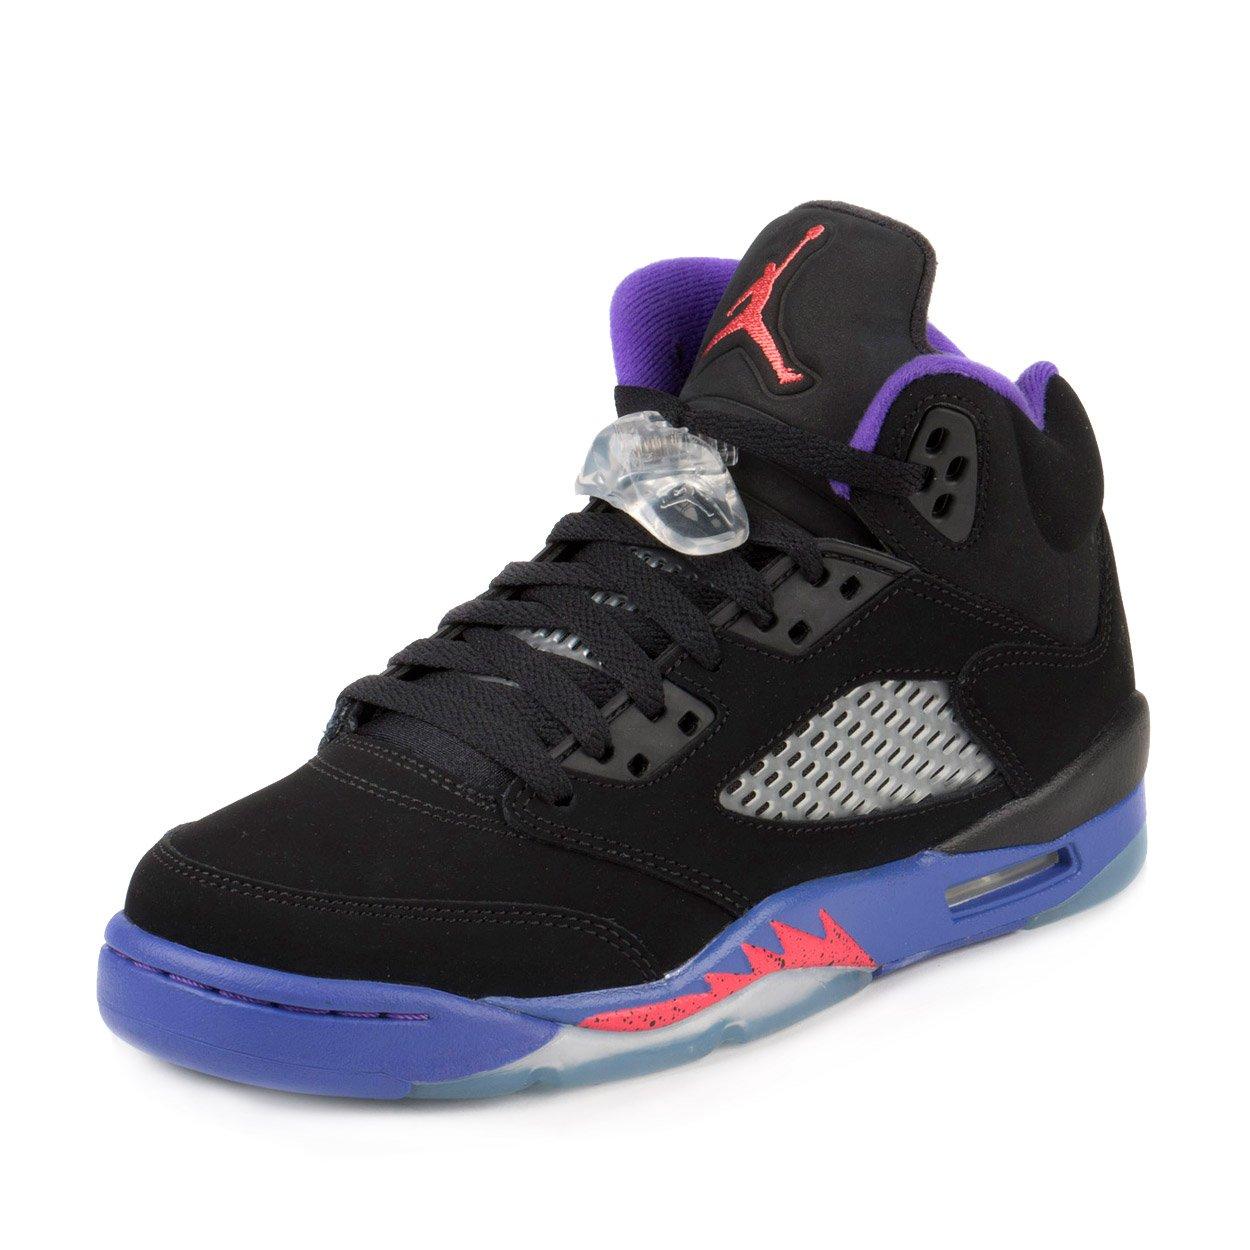 Nike Girls Air Jordan 5 Retro GG Raptor Black/Ember Glow-Fierce Purple Leather Size 4.5Y